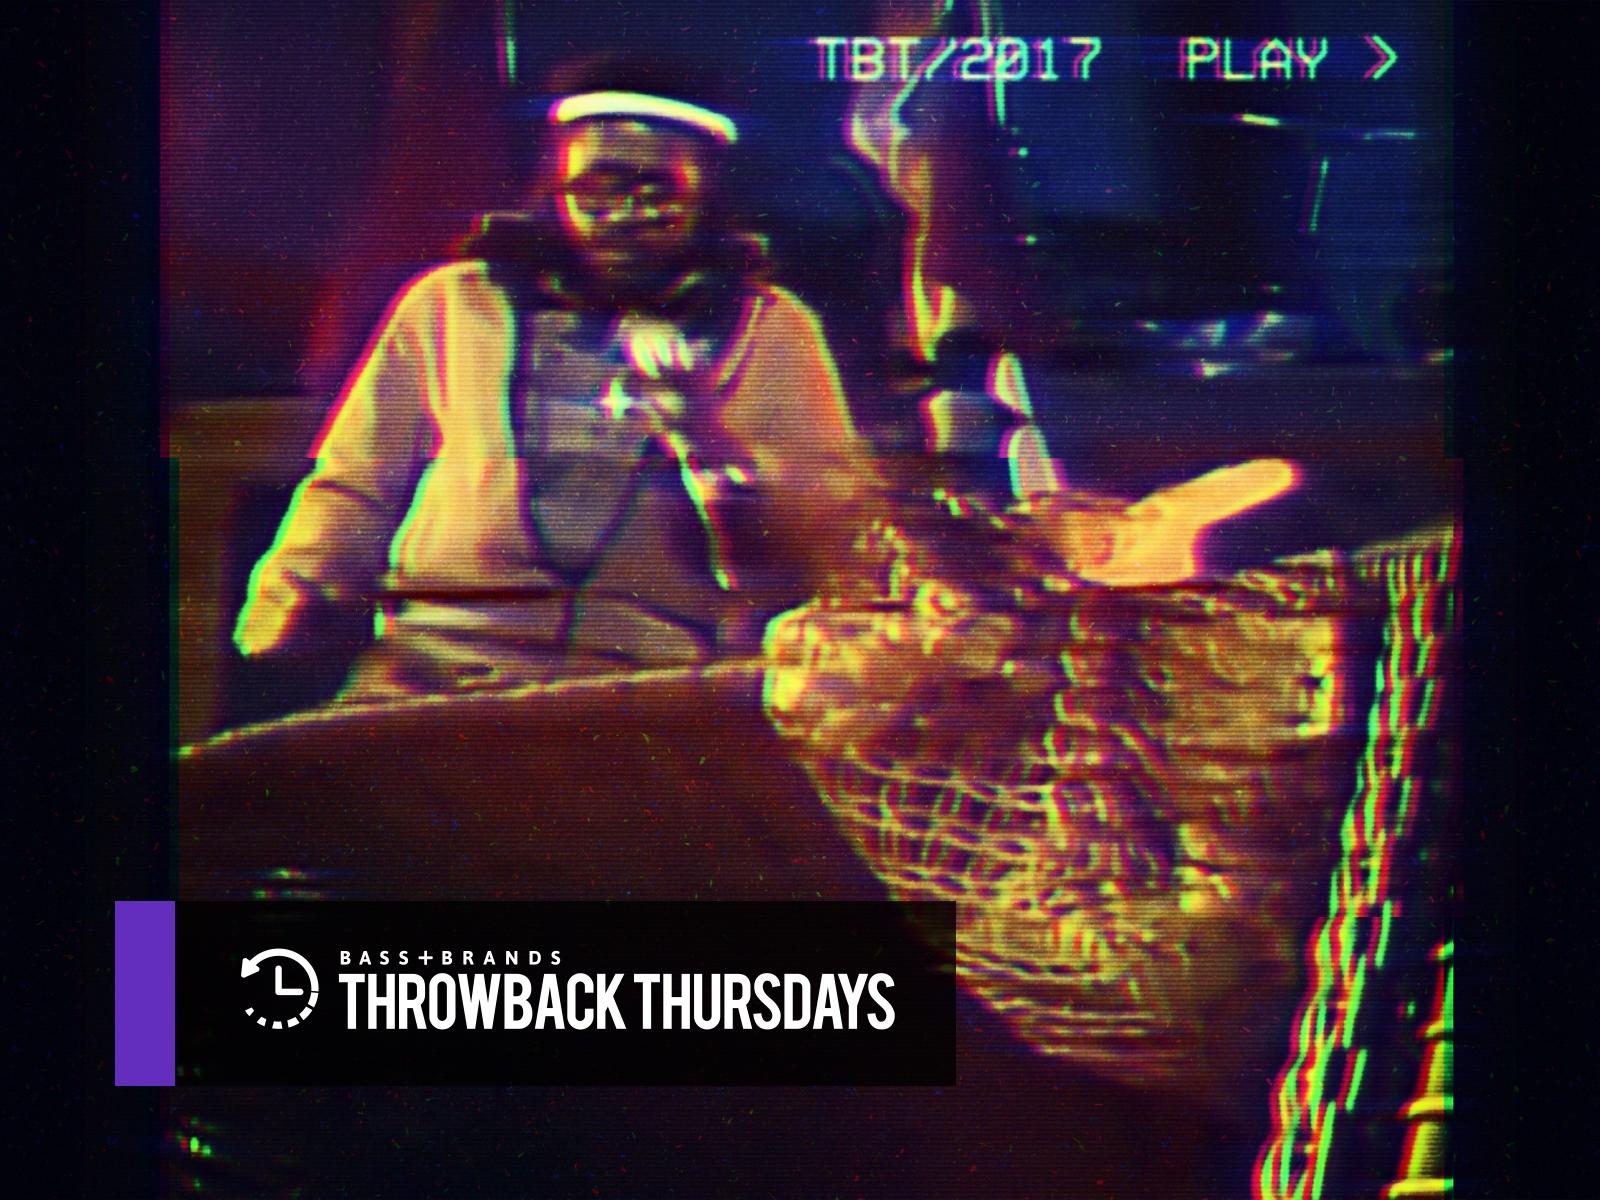 Johnny B. Goode - Peter Tosh - Throwback Thursday